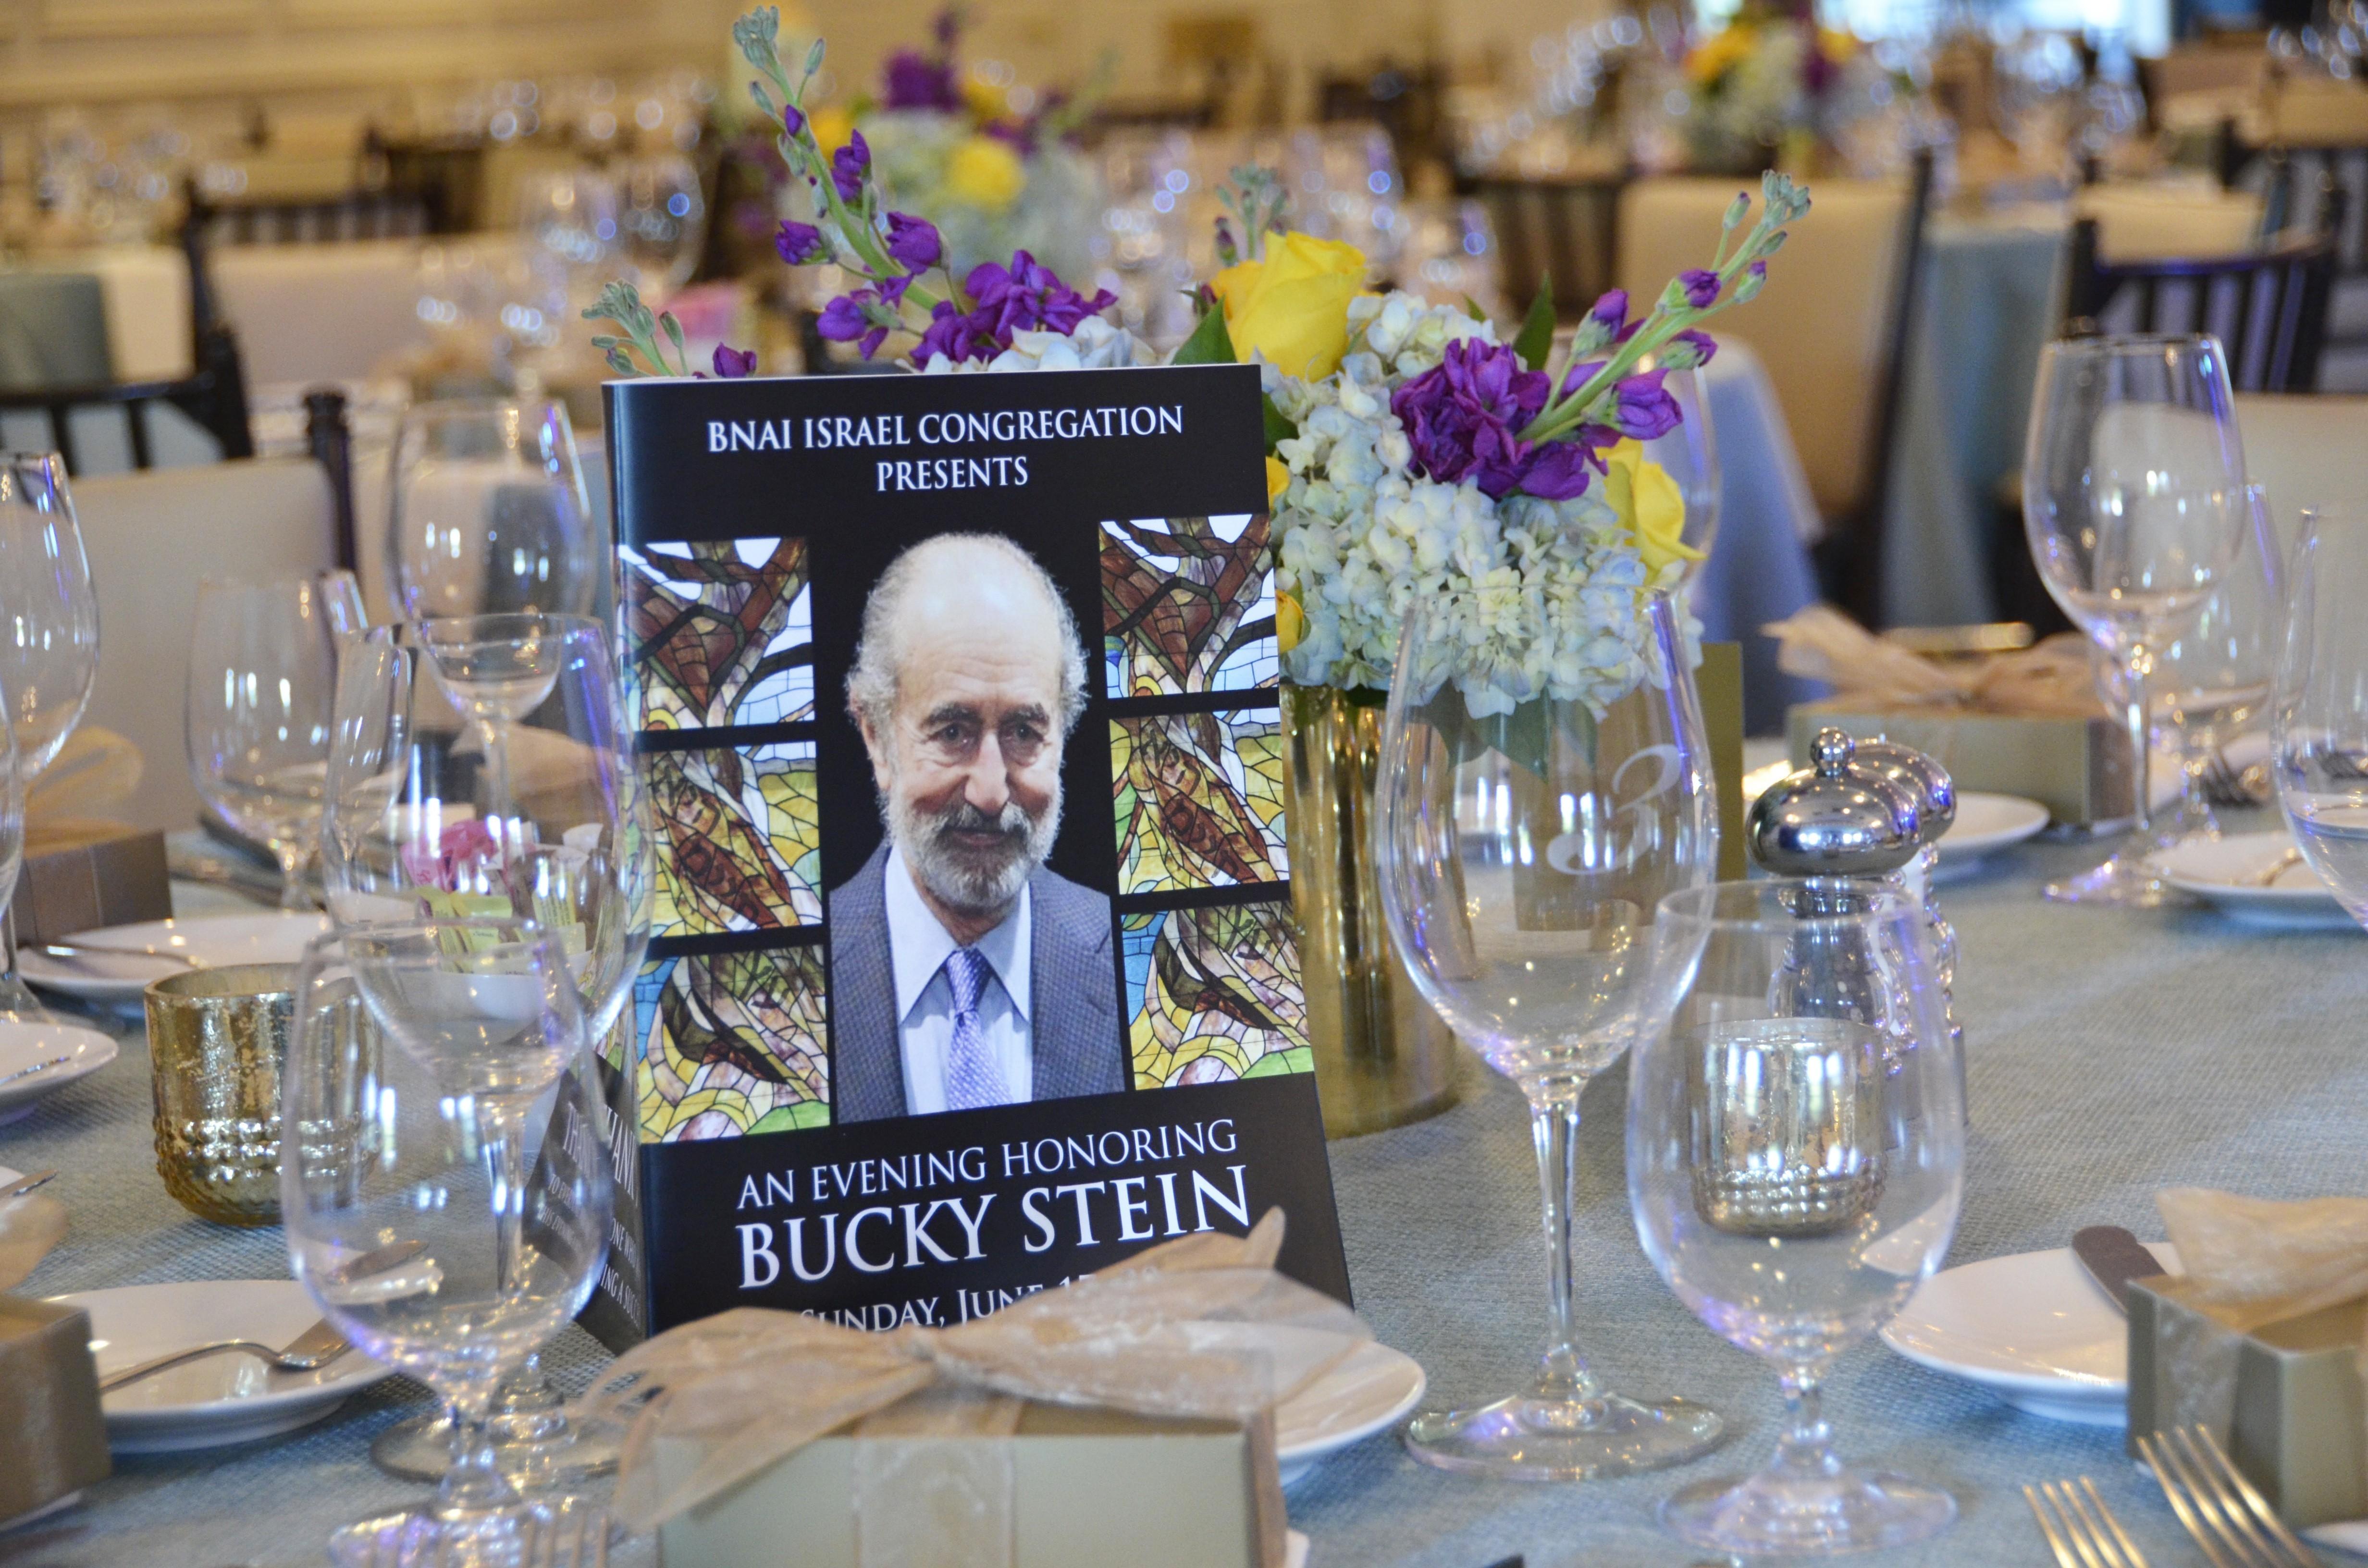 "<span class=""slider_title"">                                     Bucky Stein event                                </span>"